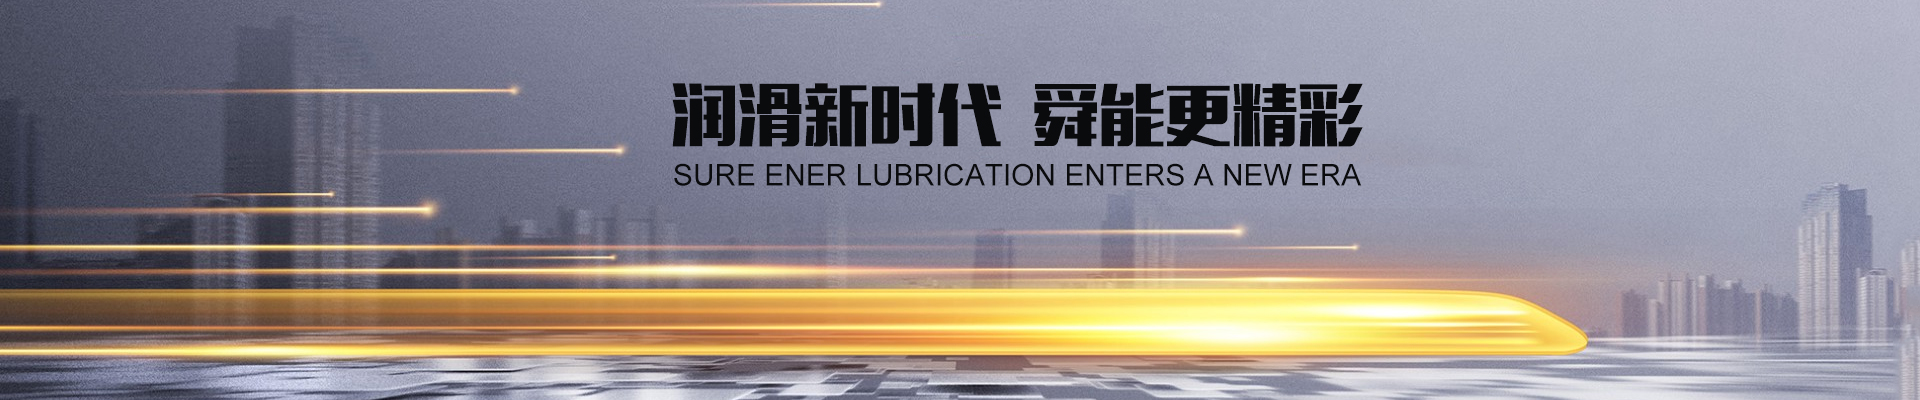 润滑产品专业制造商  MANUFACTURER OF LUBRICATION PRODUCTS